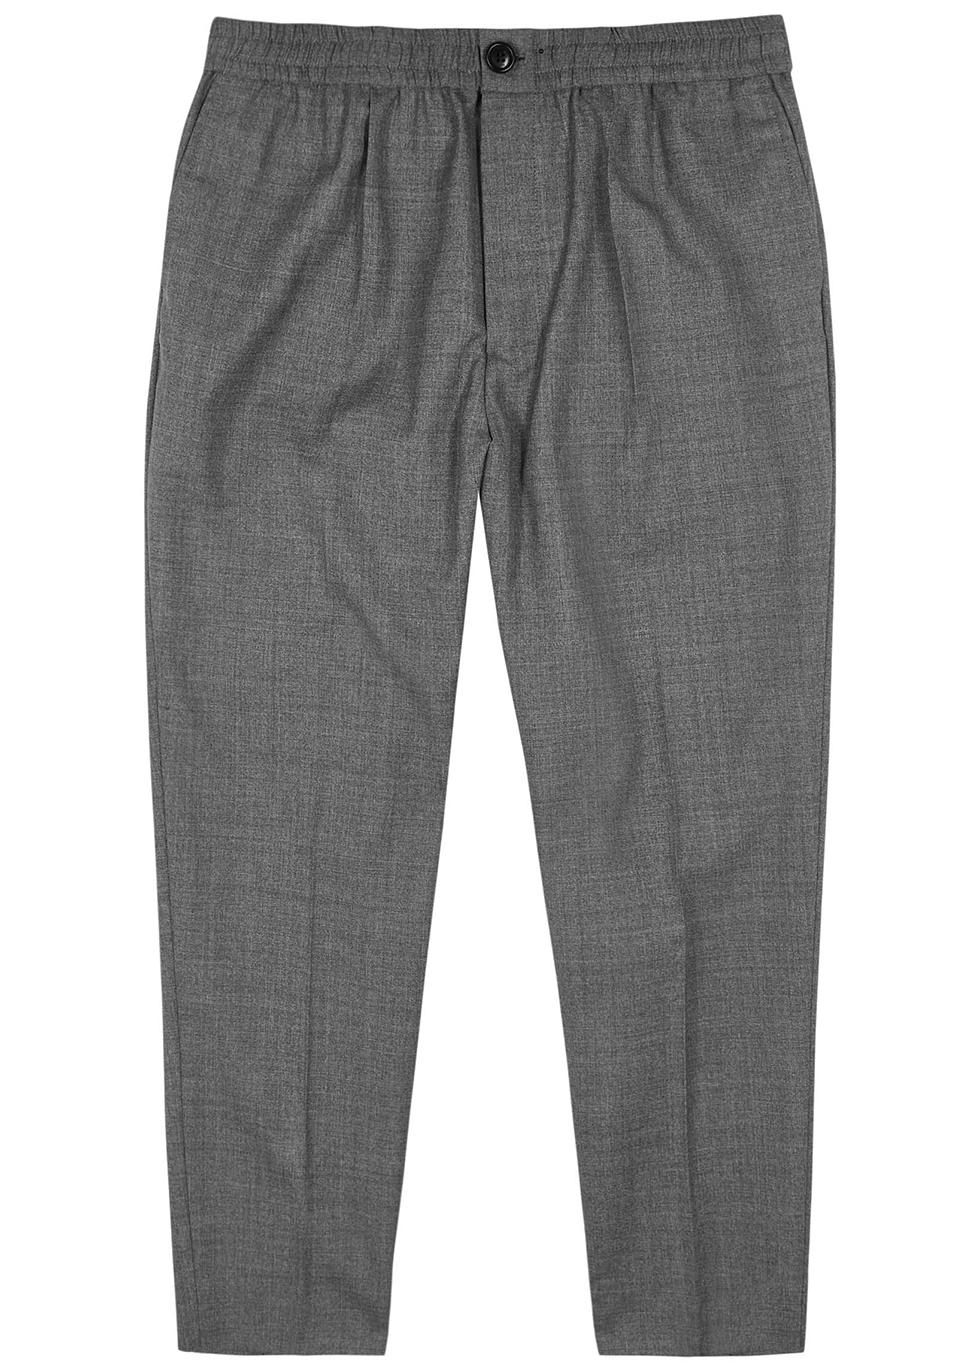 Grey woven wool trousers